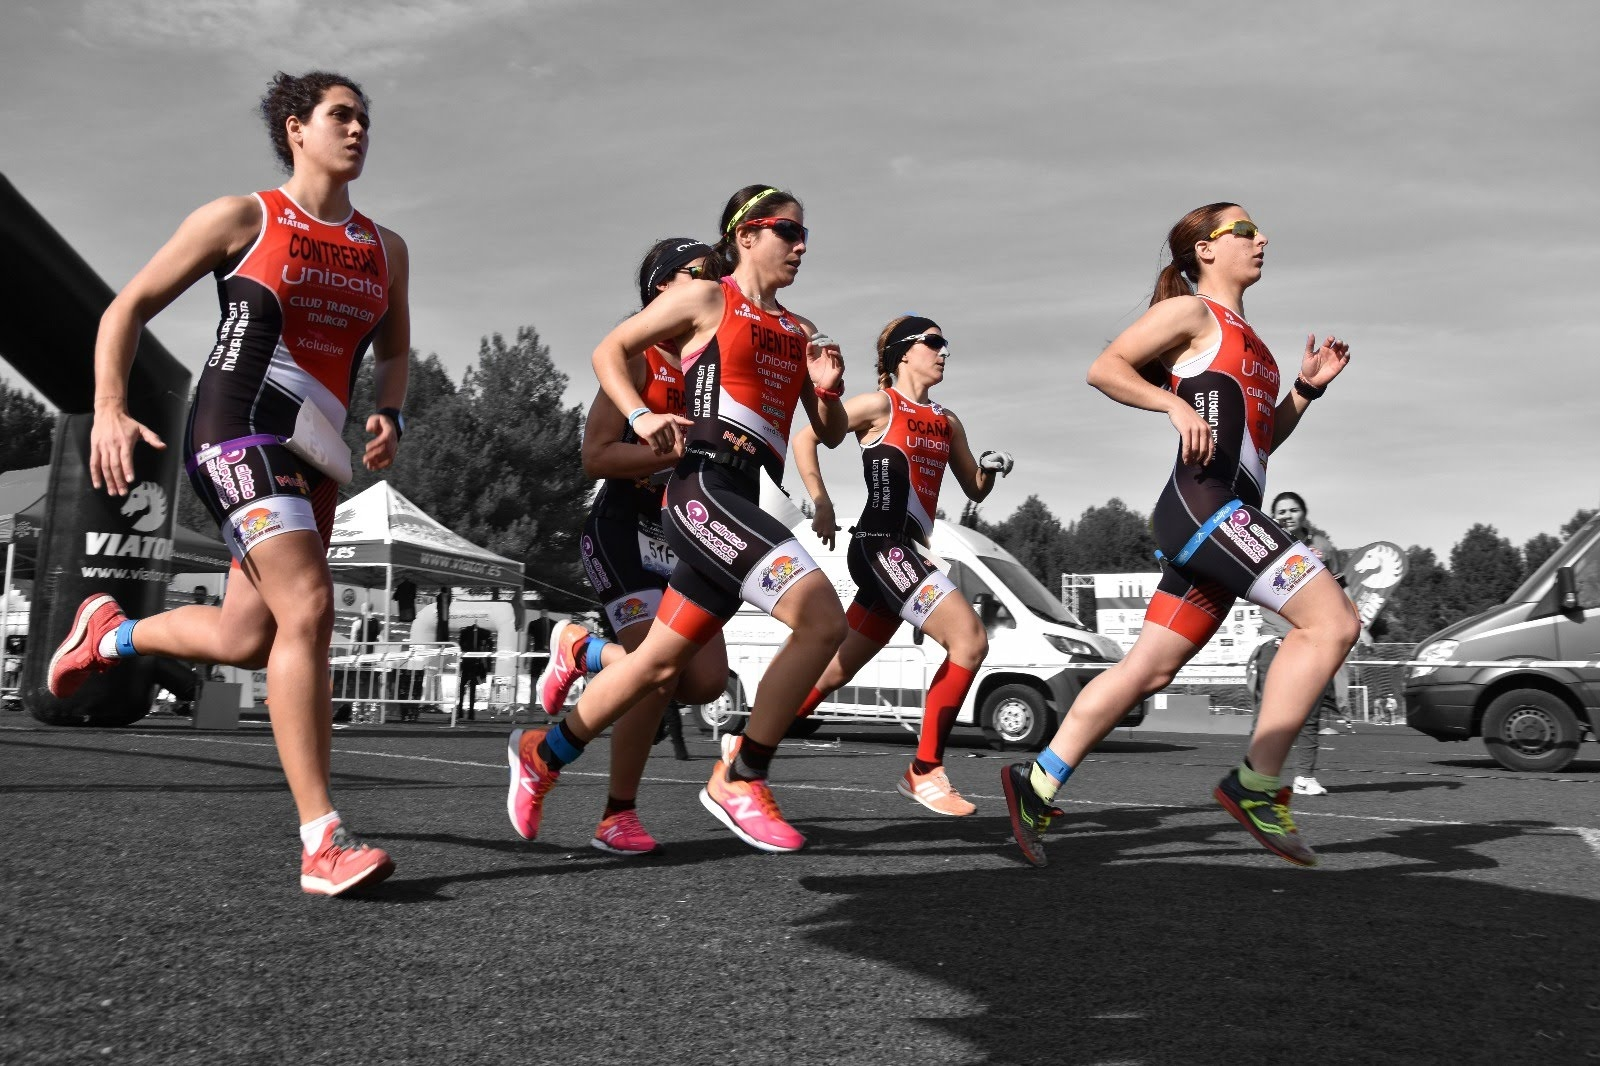 Club_Triatlon_Murcia_Unidata__Campeon_Regional_Duatln_por_Equipos_2018__Triatlon_Murcia_Archena_Femenino_1